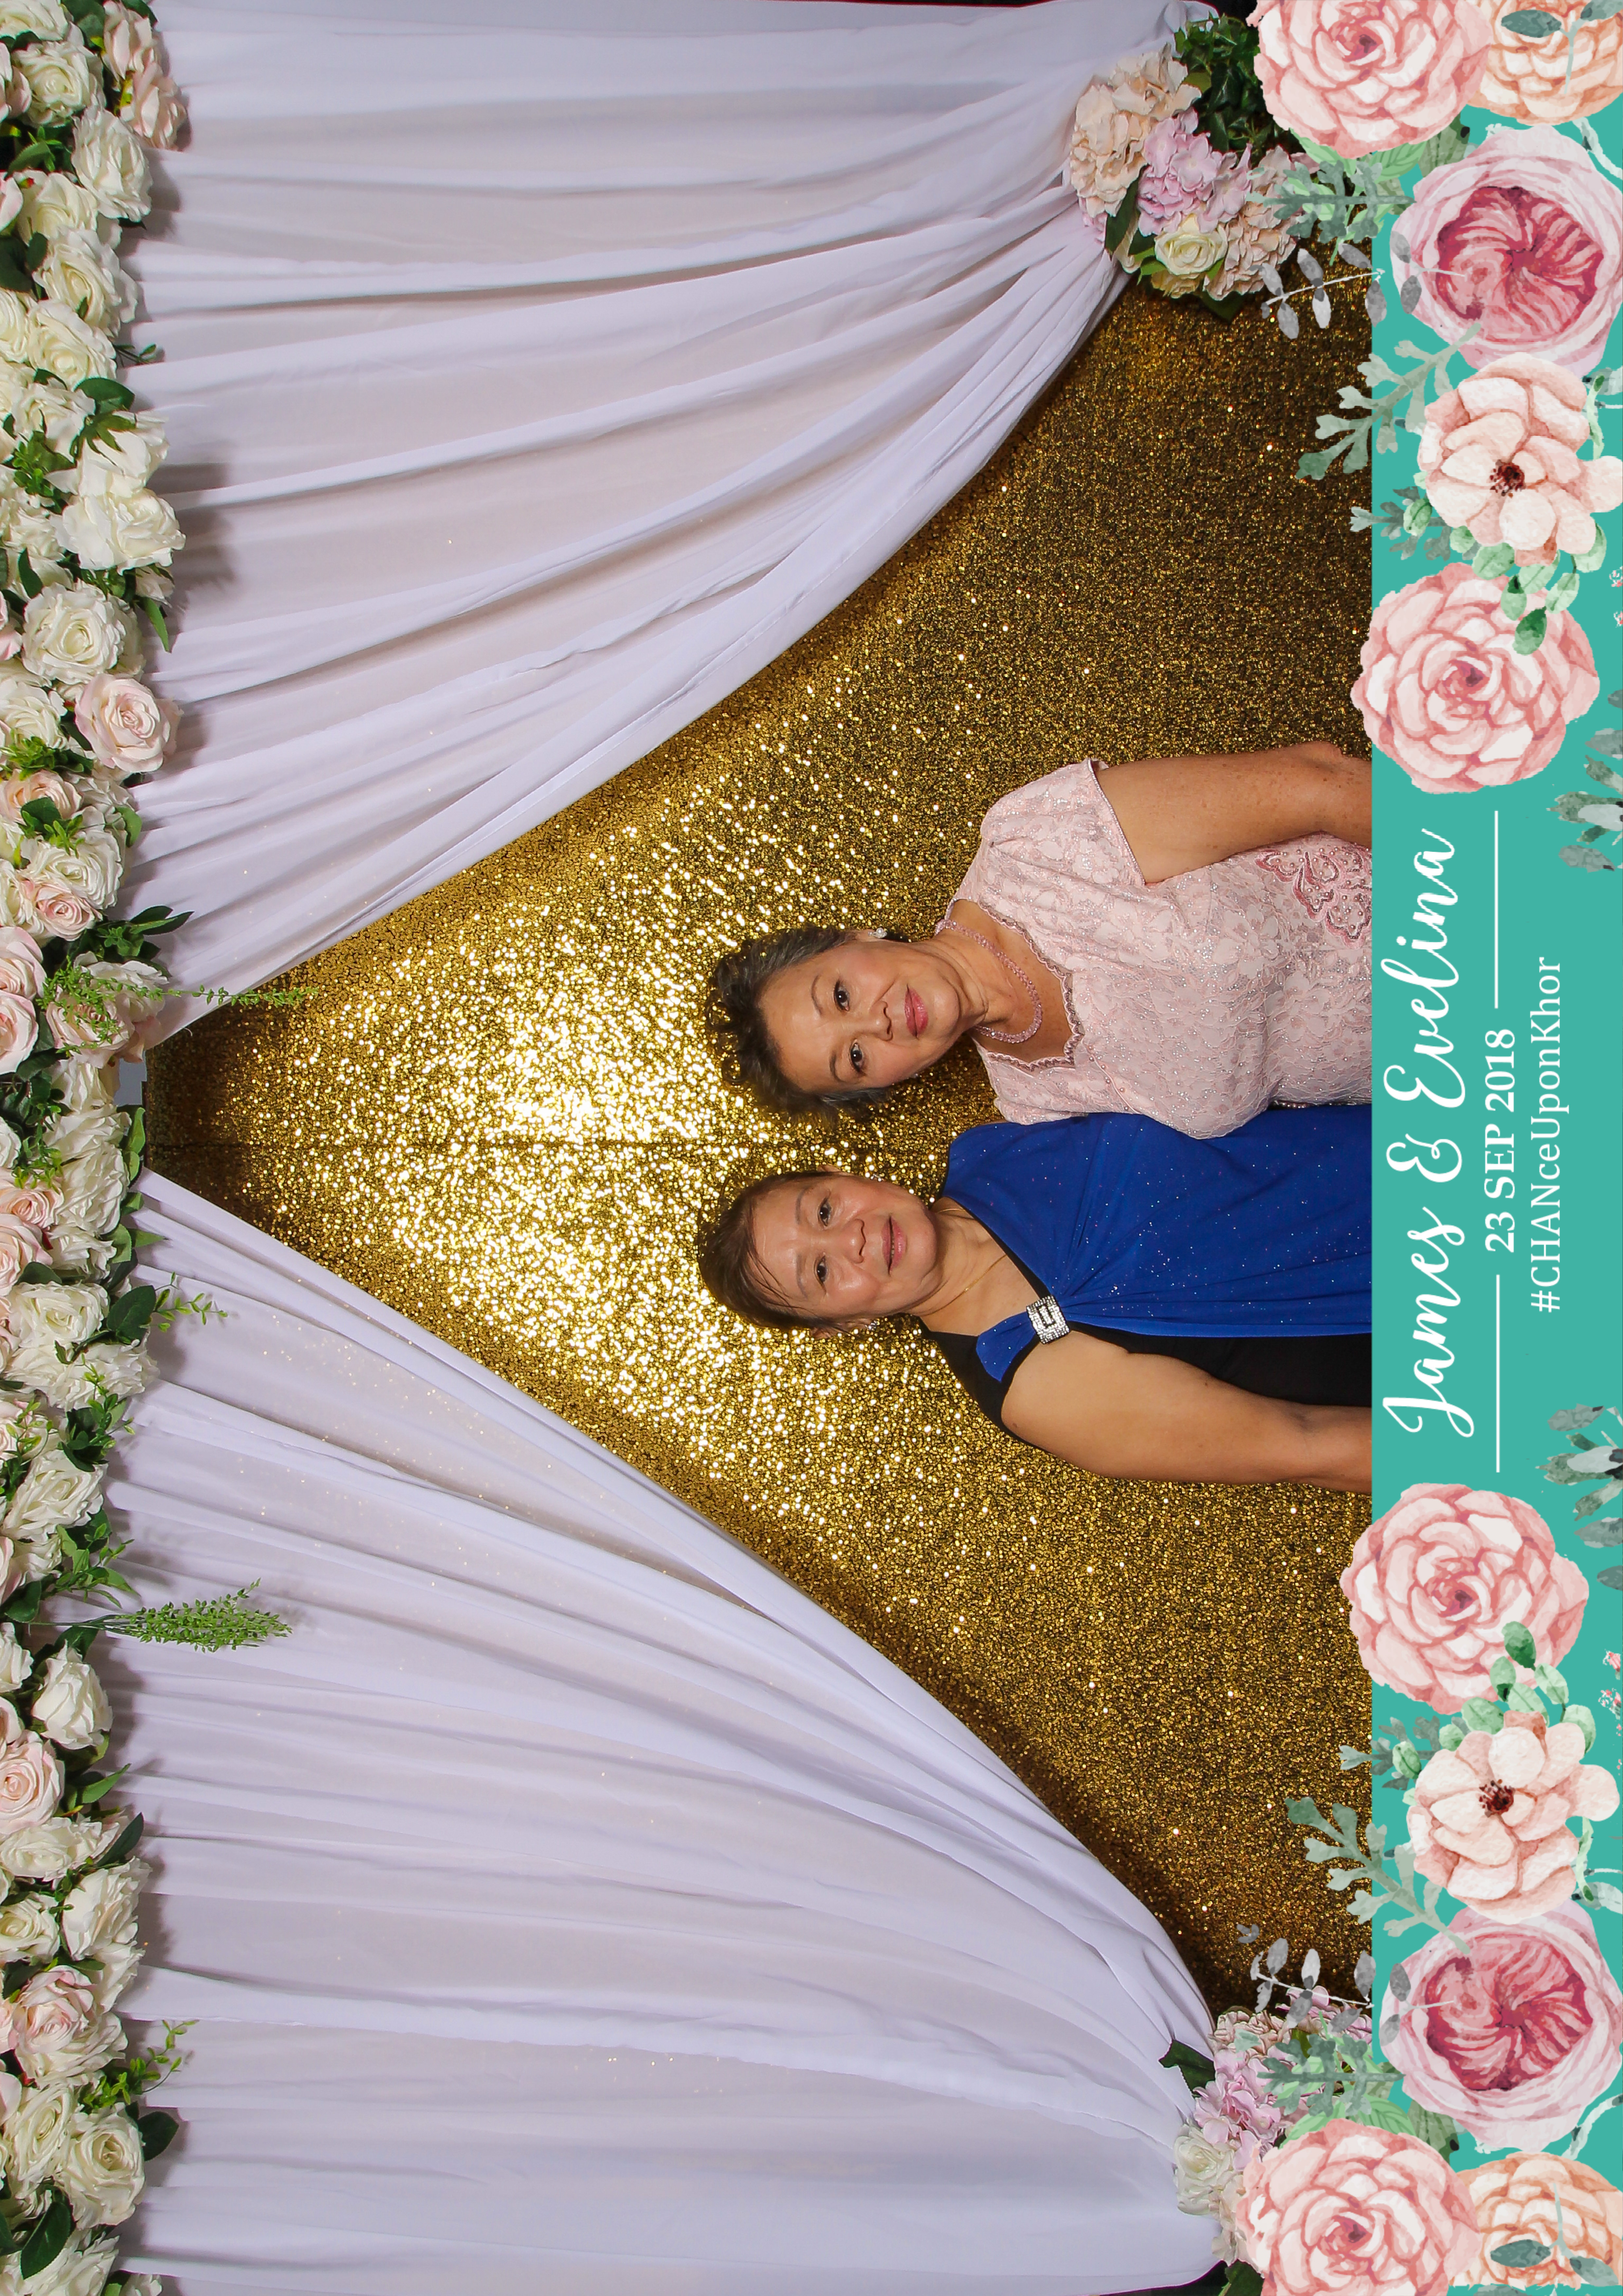 wedding photo booth singapore-9